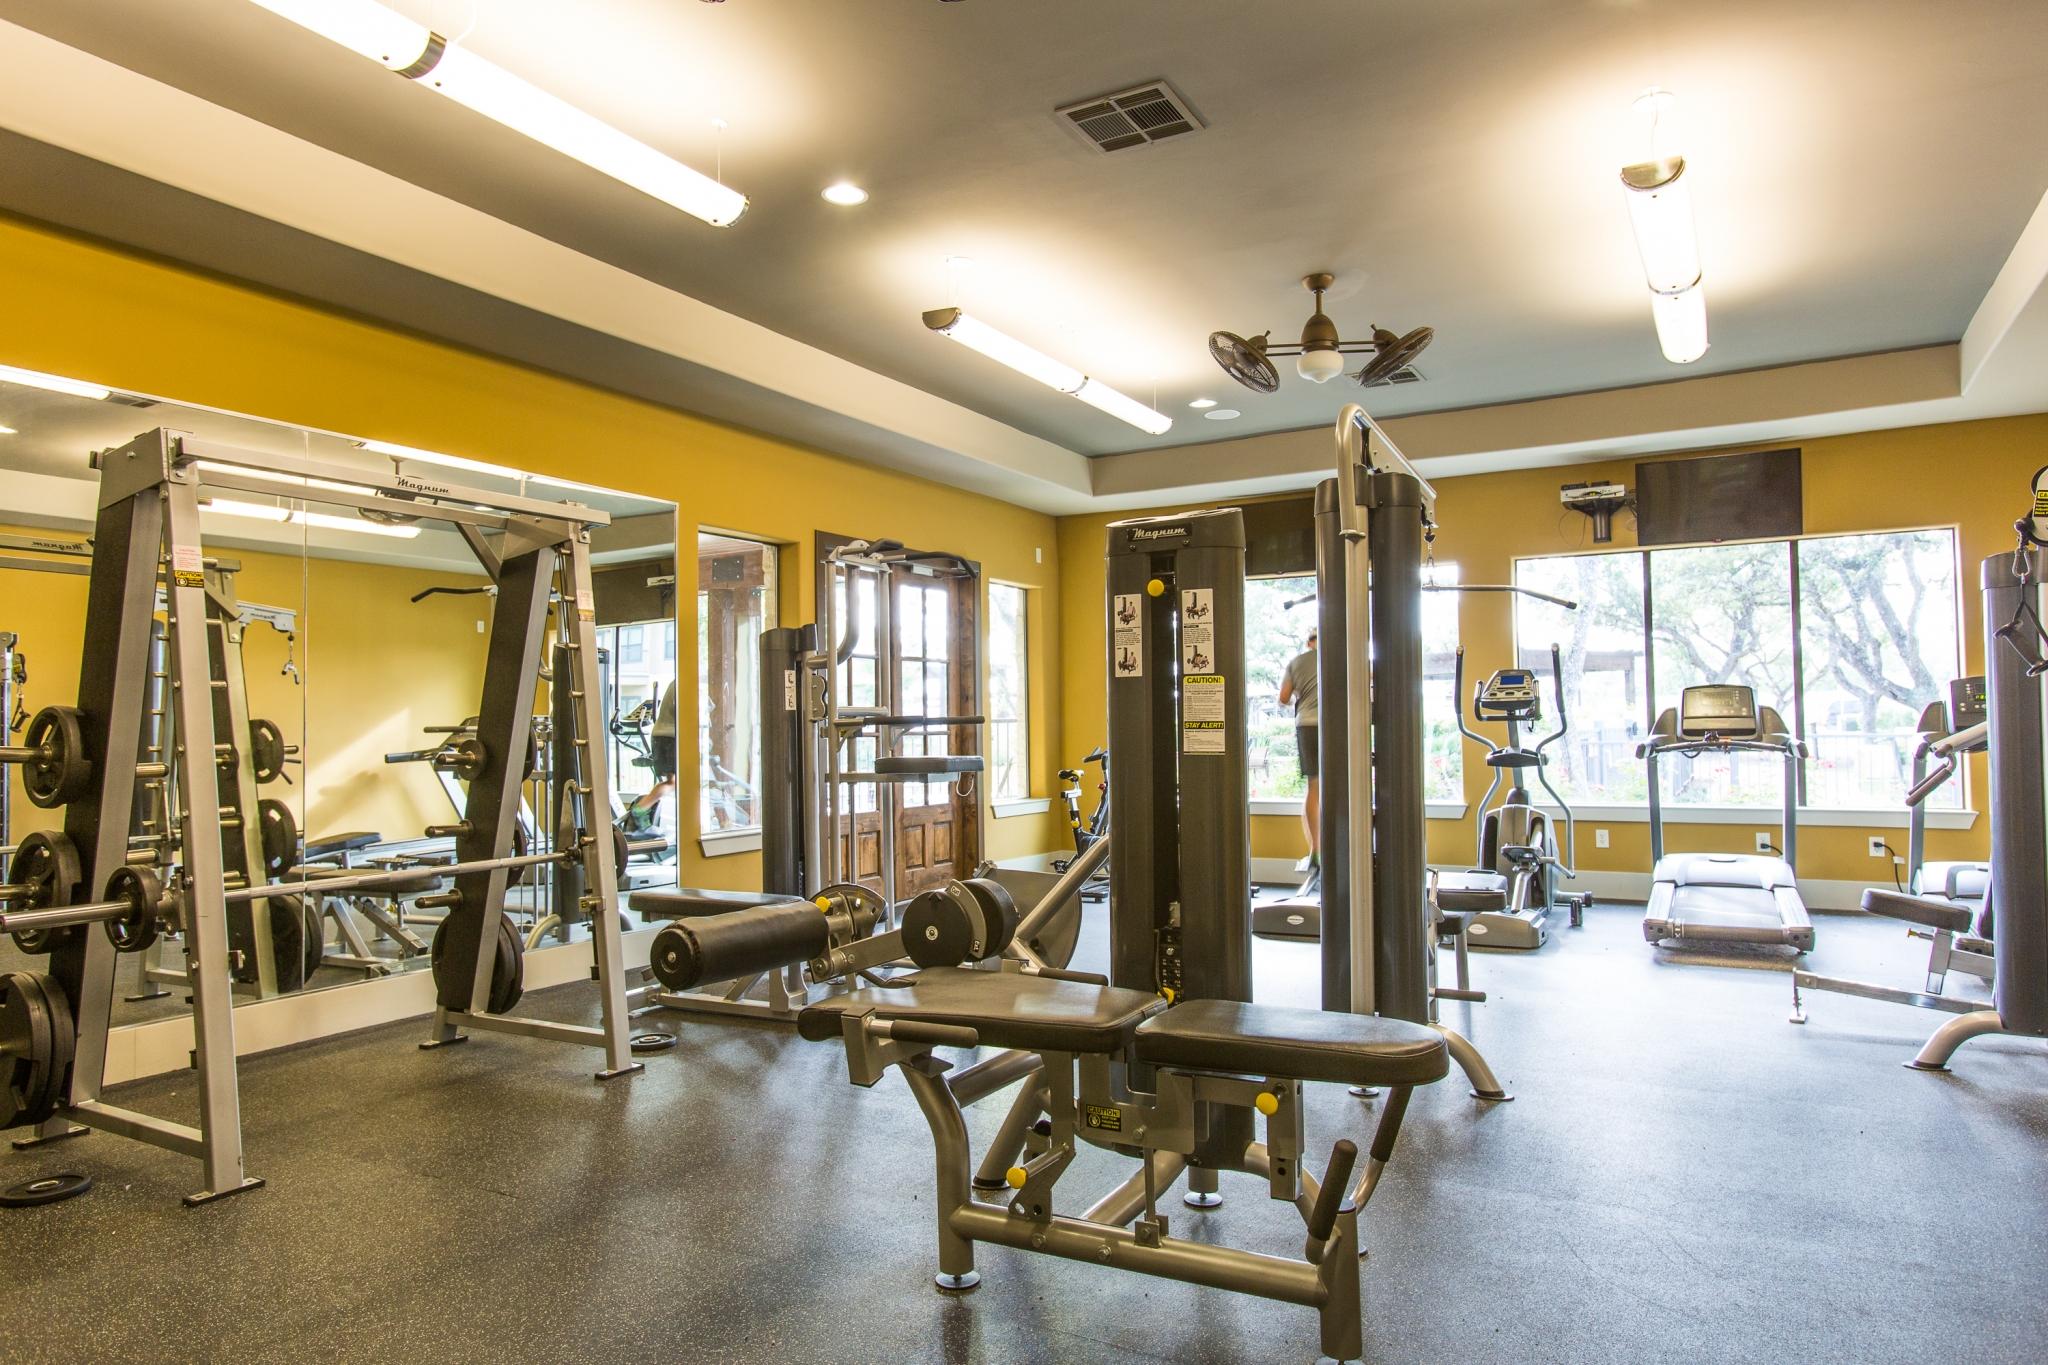 Image of 24 Hr Fitness Center for Platinum Shavano Oaks Apartments